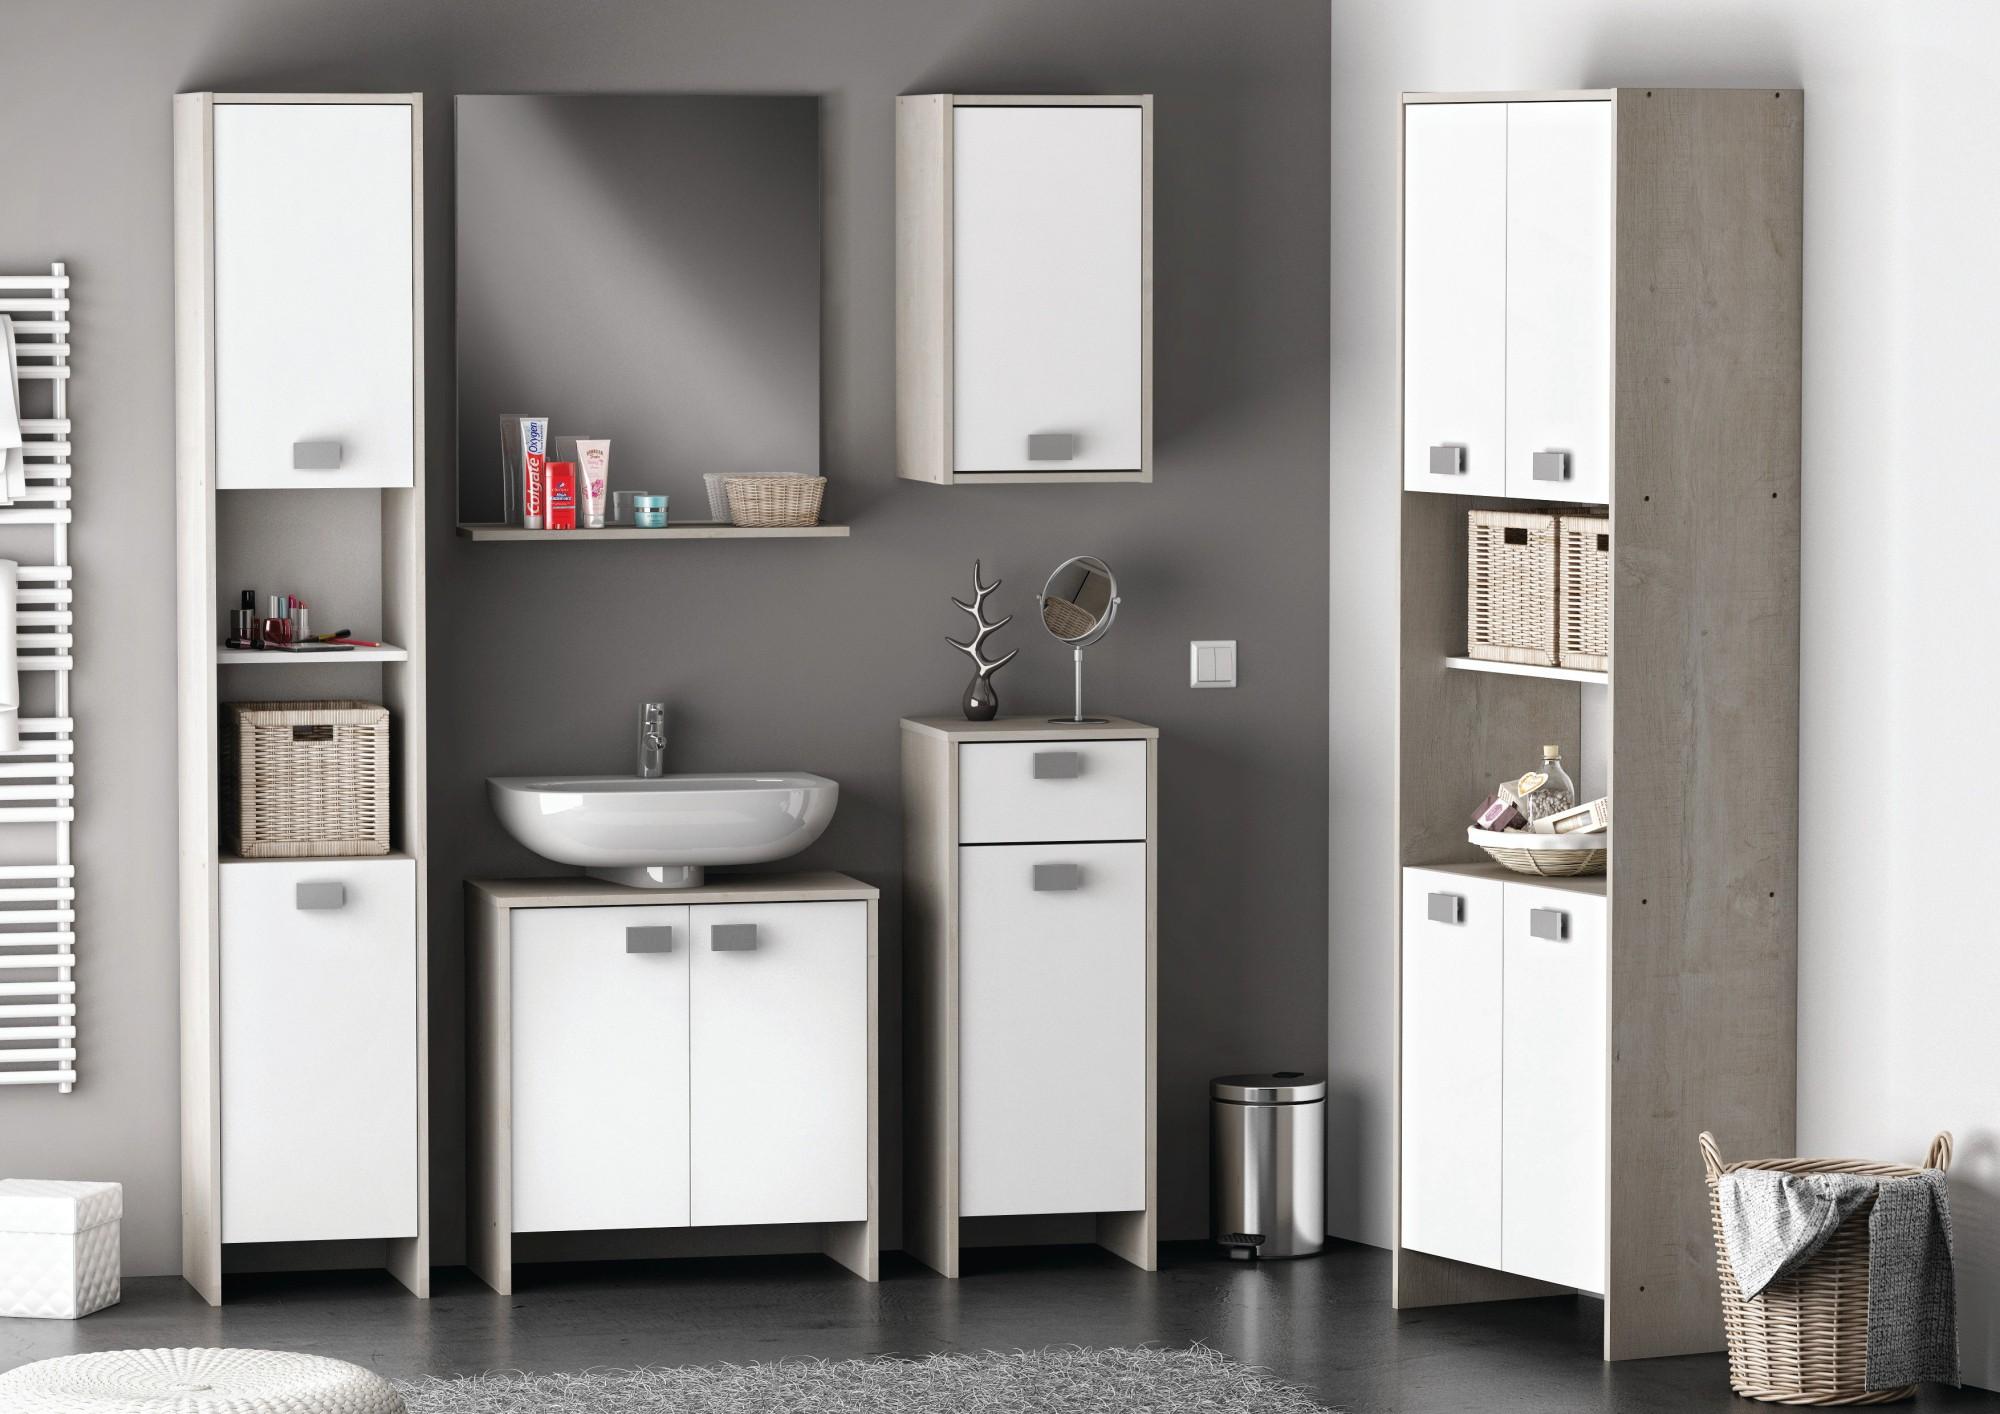 Meuble salle de bains but - Les meubles de salle de bain ...